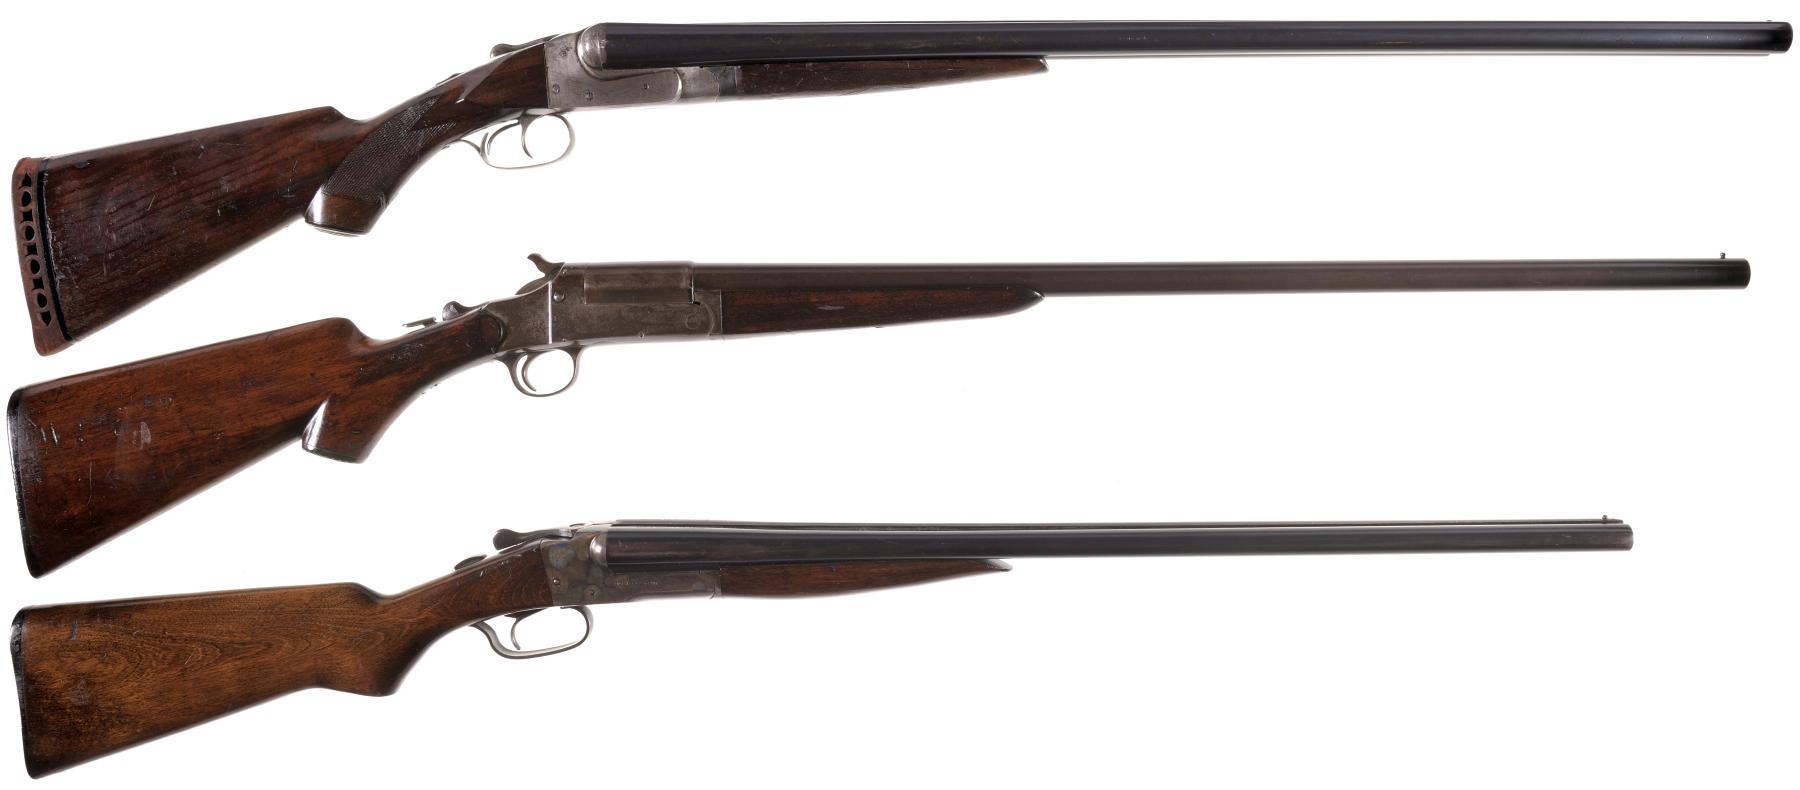 Three Shotguns -A) Ithaca Hammerless Double Barrel Shotgun